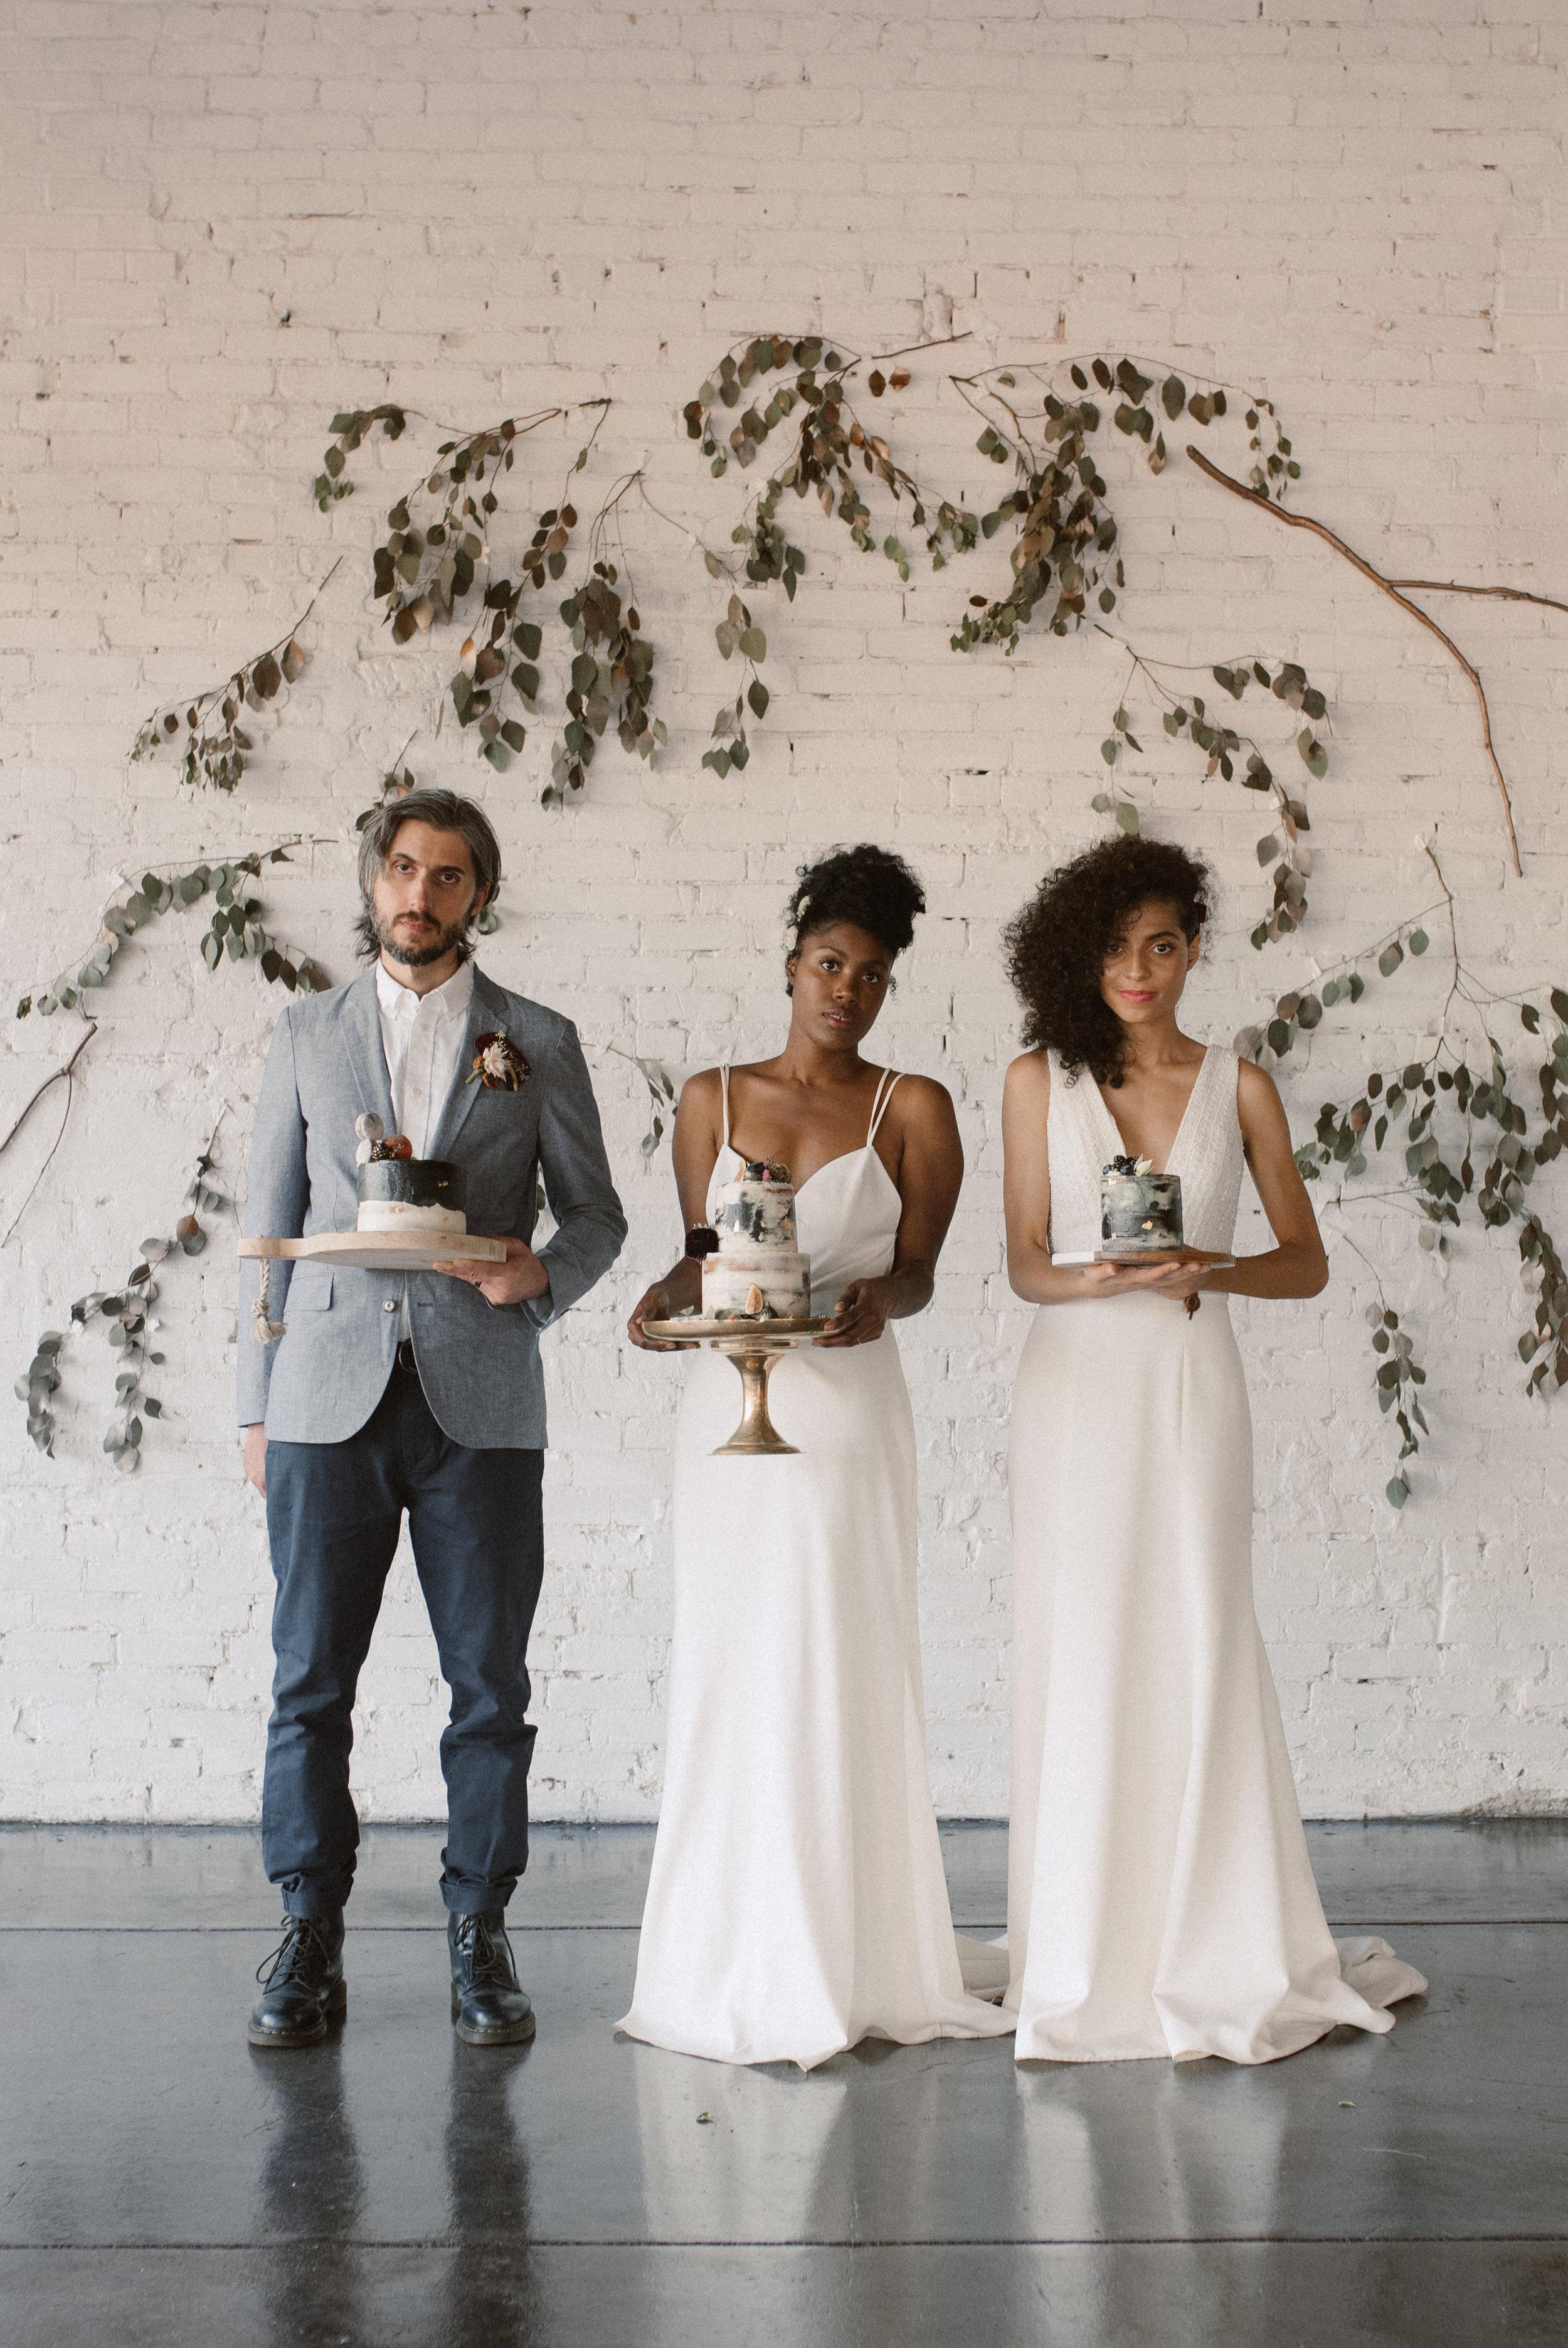 haus-820-minimal-editorial-wedding-styled-shoot-124.jpg